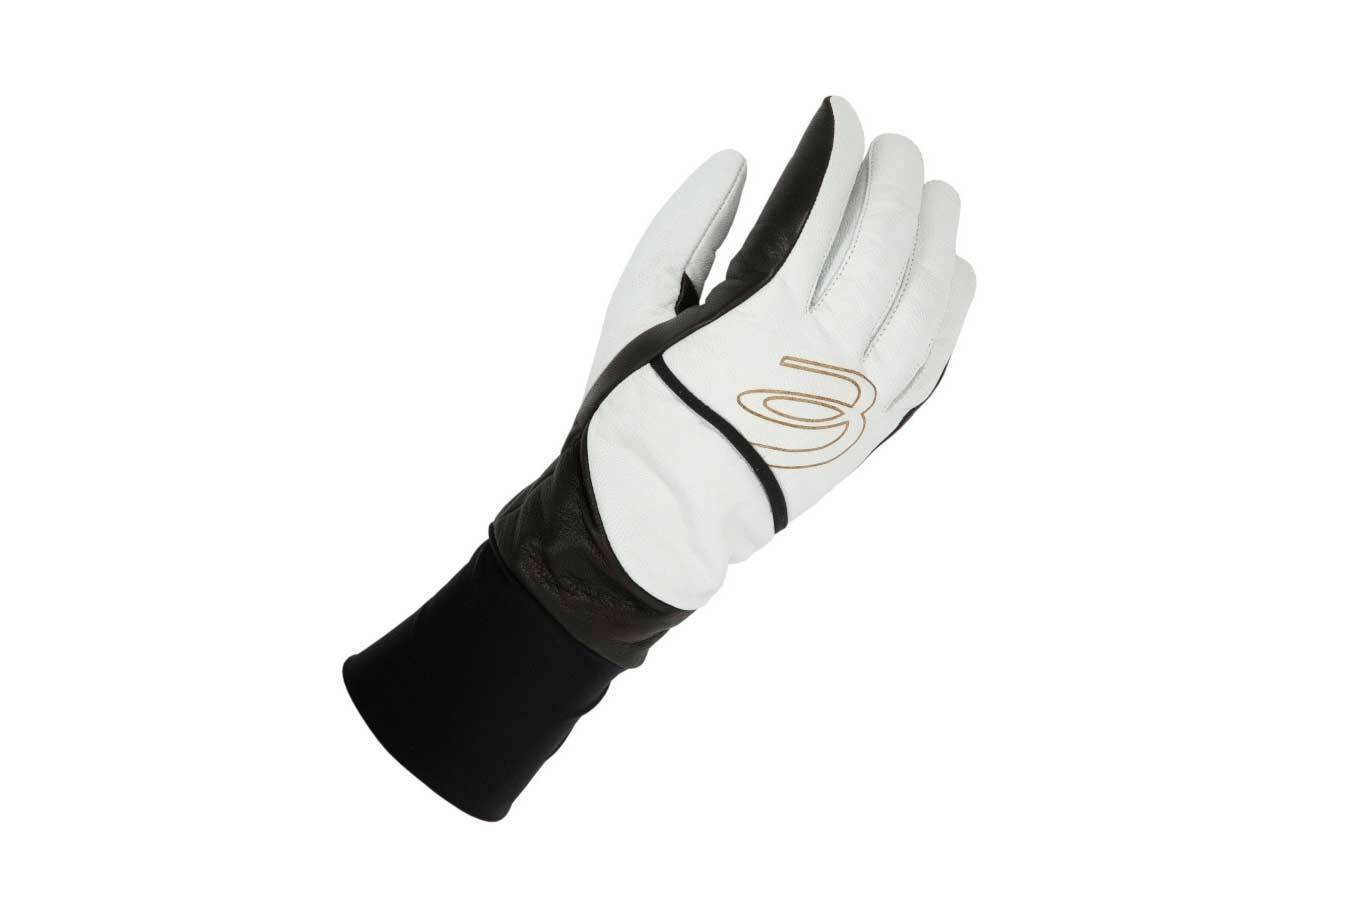 Basisrausch Kristall FLEX Flying Gloves   Paragliding   Hang Gliding   Brand New